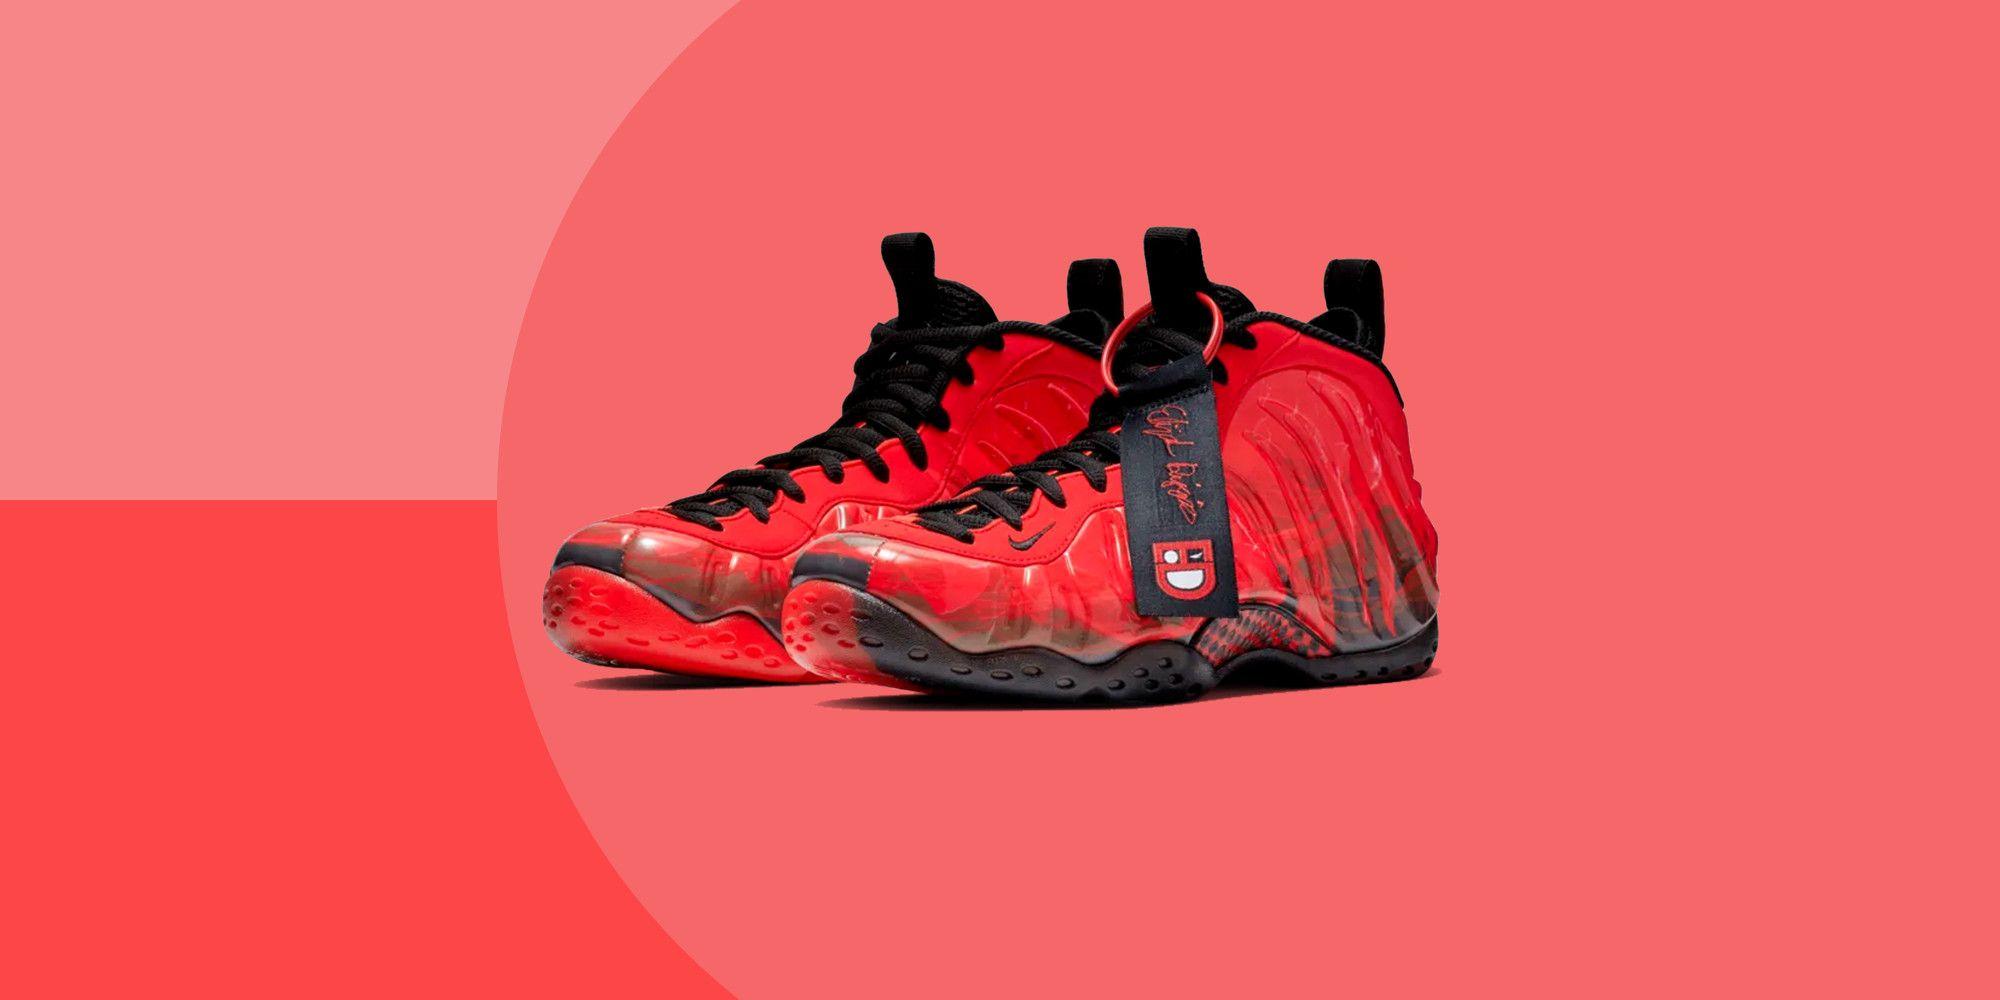 c8f77855 This Week's Biggest Sneaker Releases - Sneaker Releases 2019